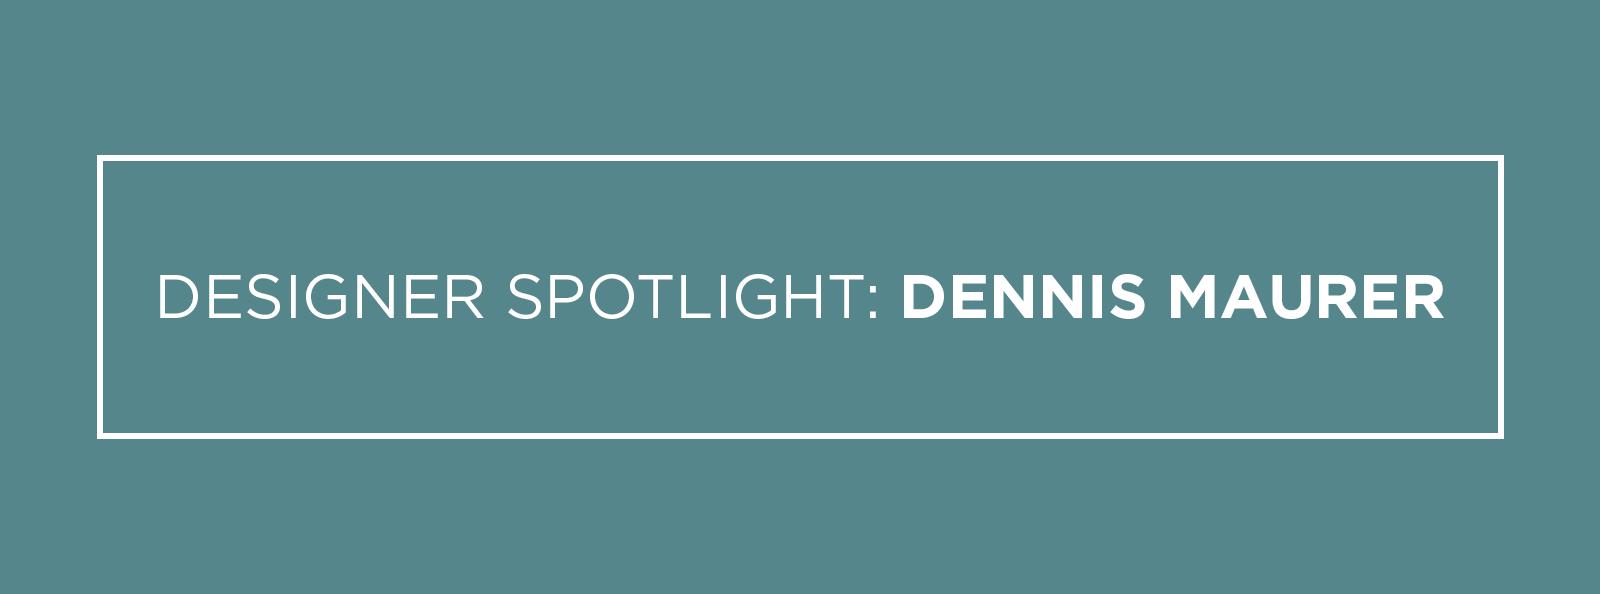 Designer Spotlight Dennis Maurer